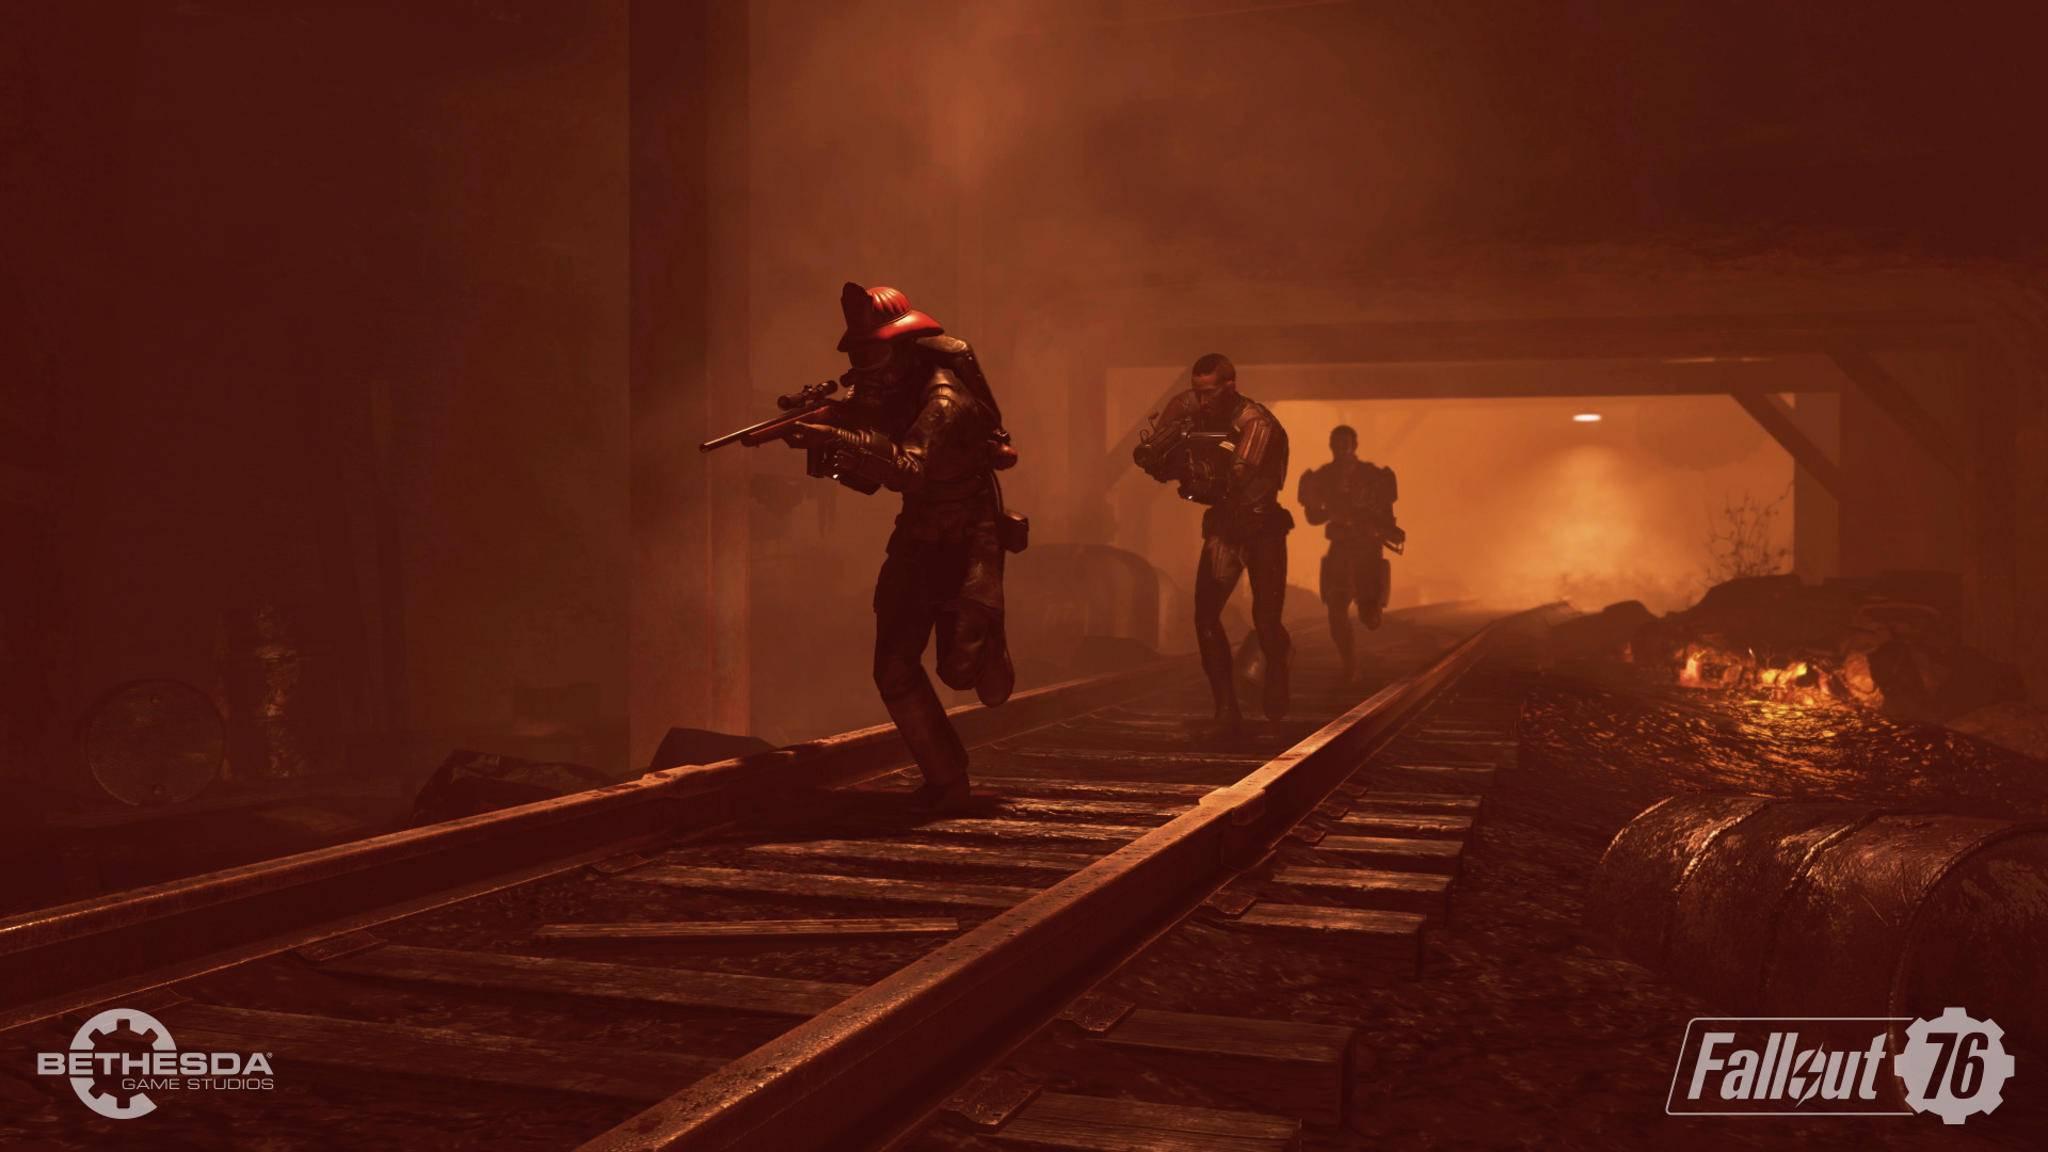 """Fallout 76"" und andere neue Bethesda-Games bleiben Battle-Royale-frei."